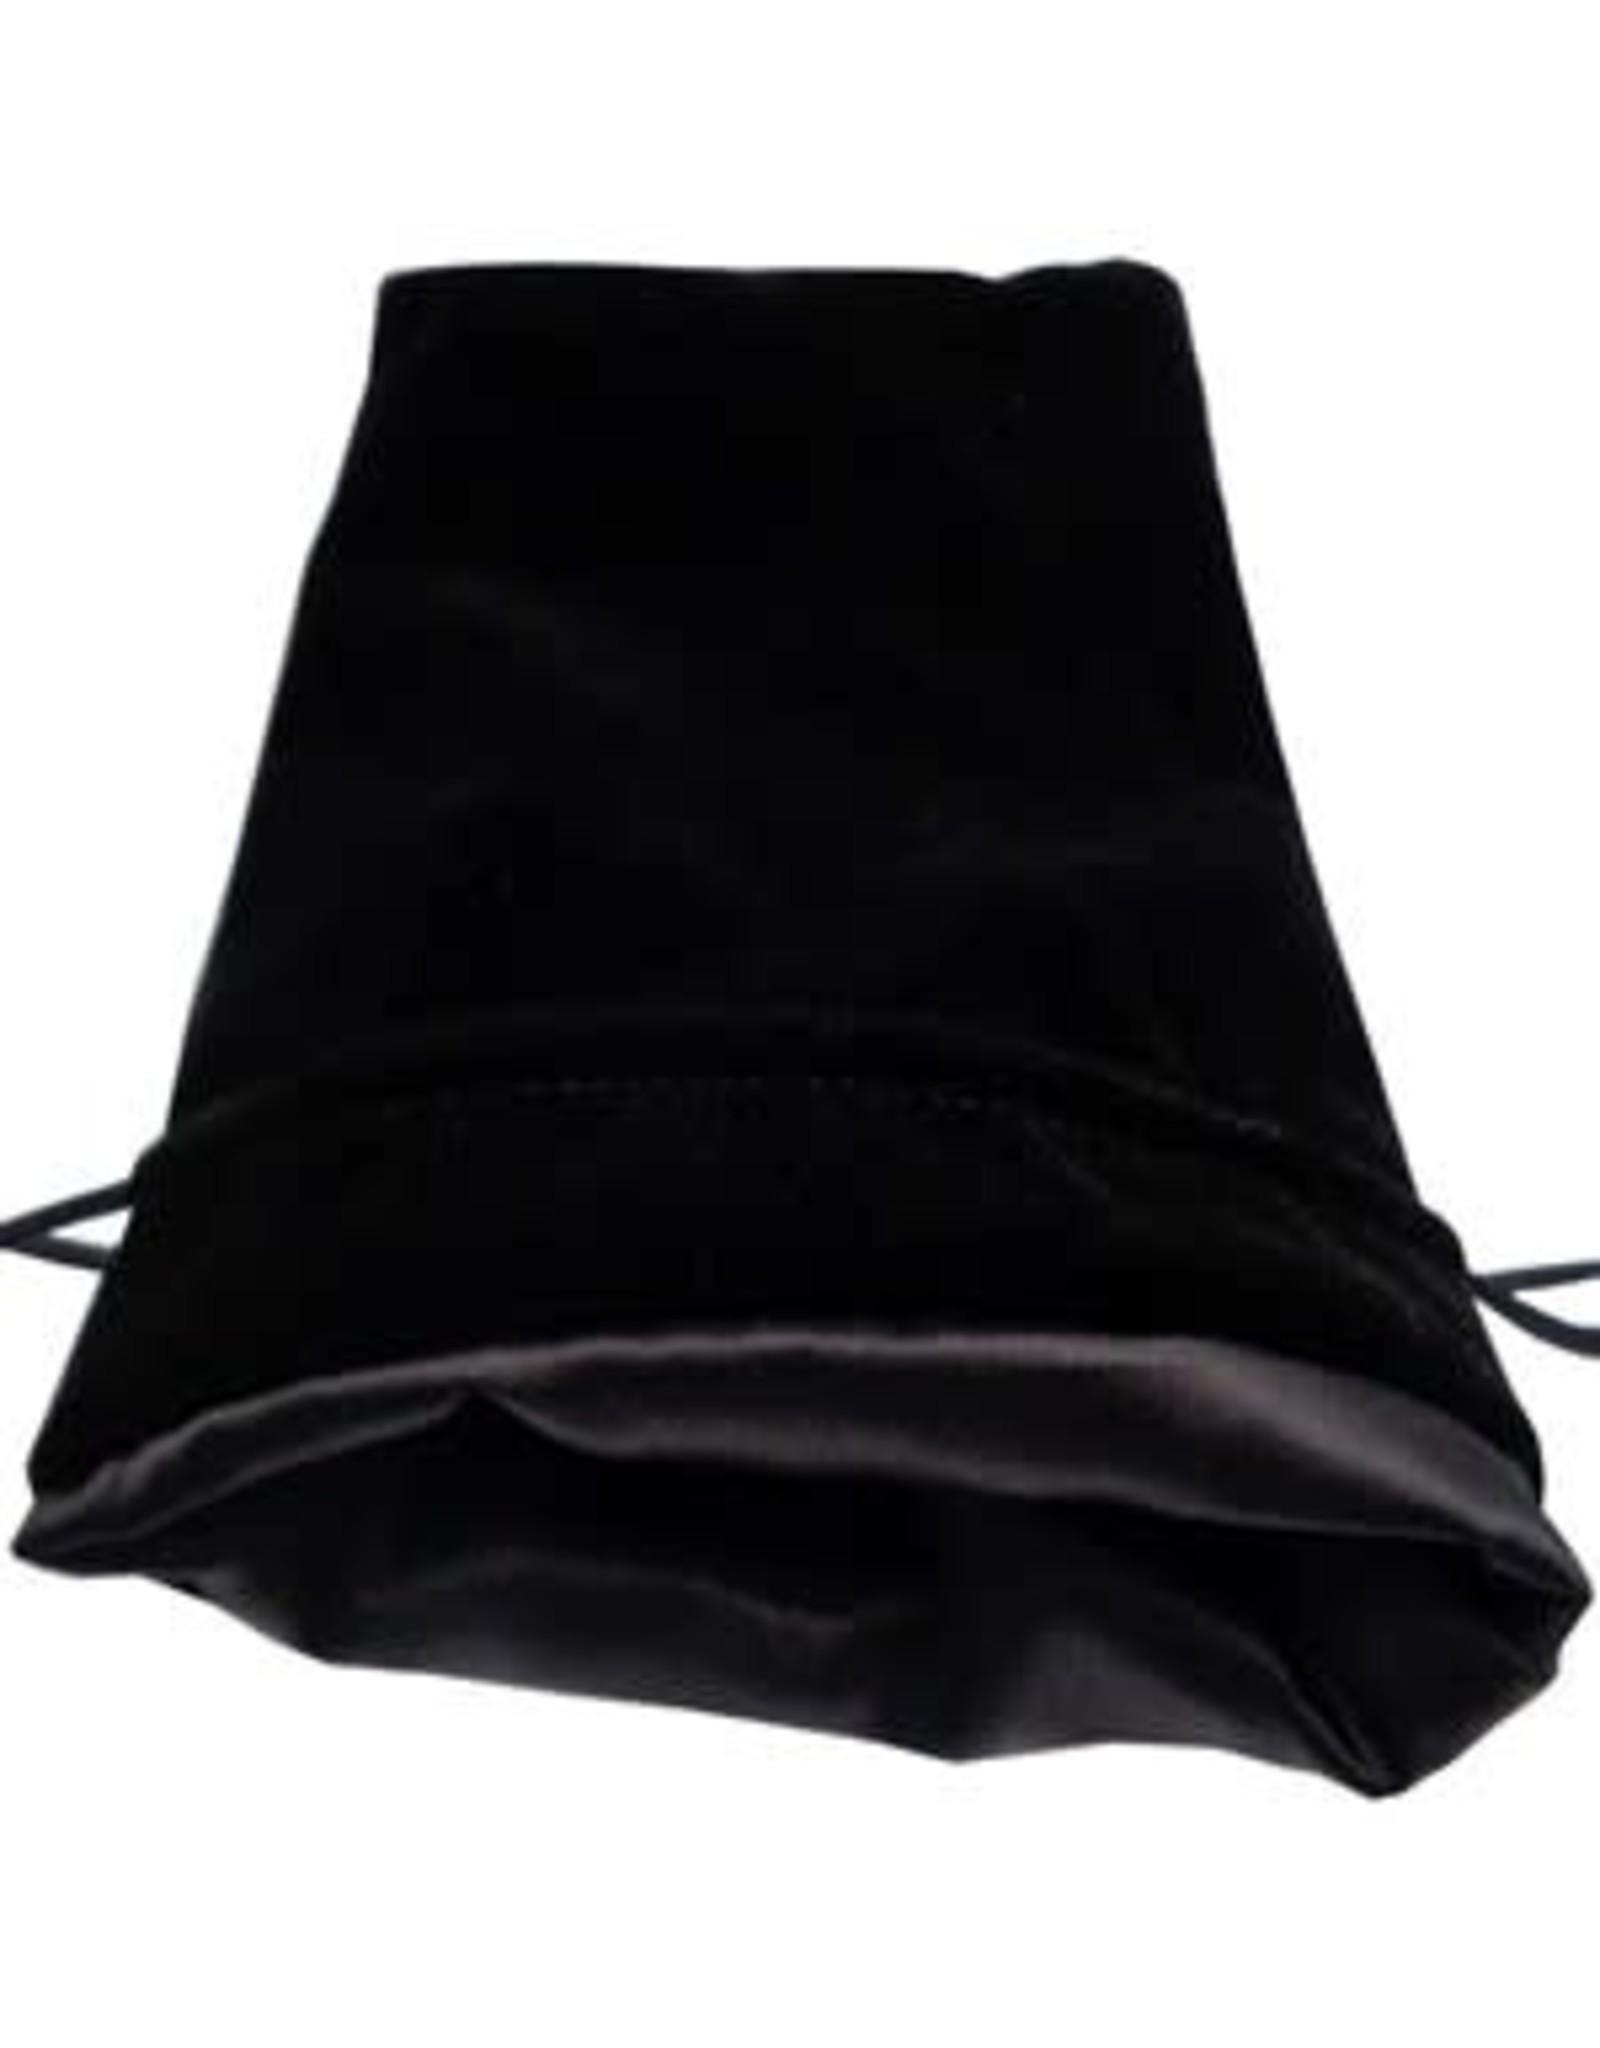 Metallic Dice Games Black Velvet Dice Bag with Black Satin